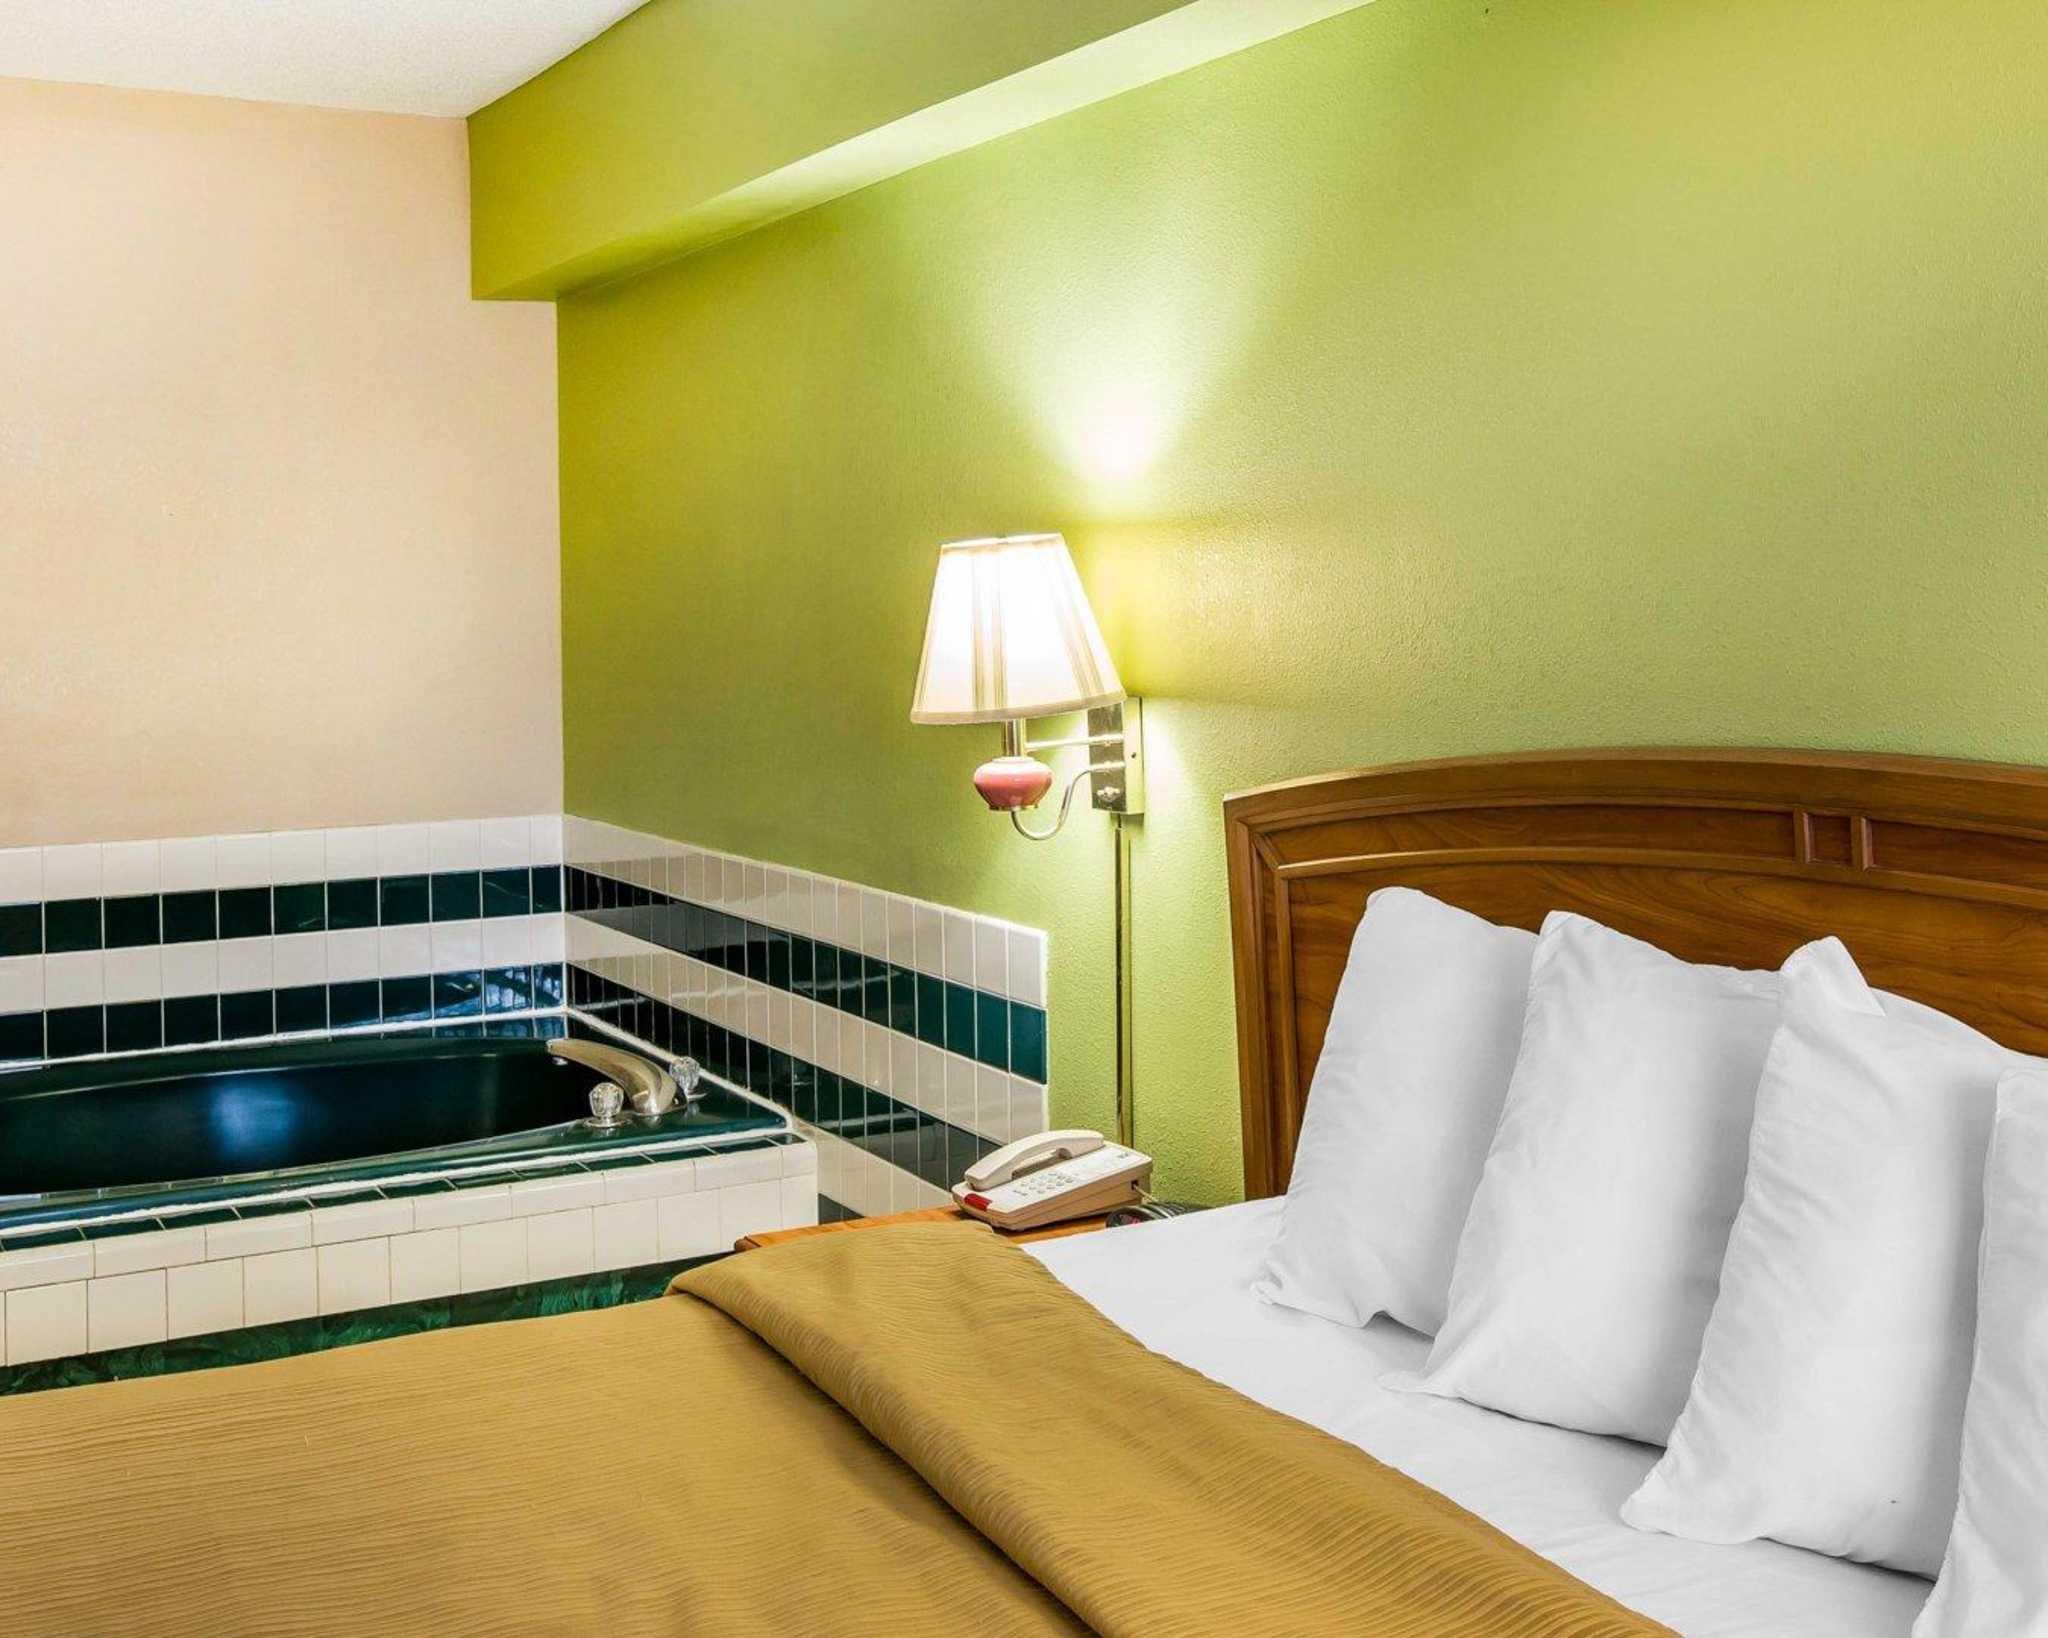 Quality Inn & Suites Dublin image 8